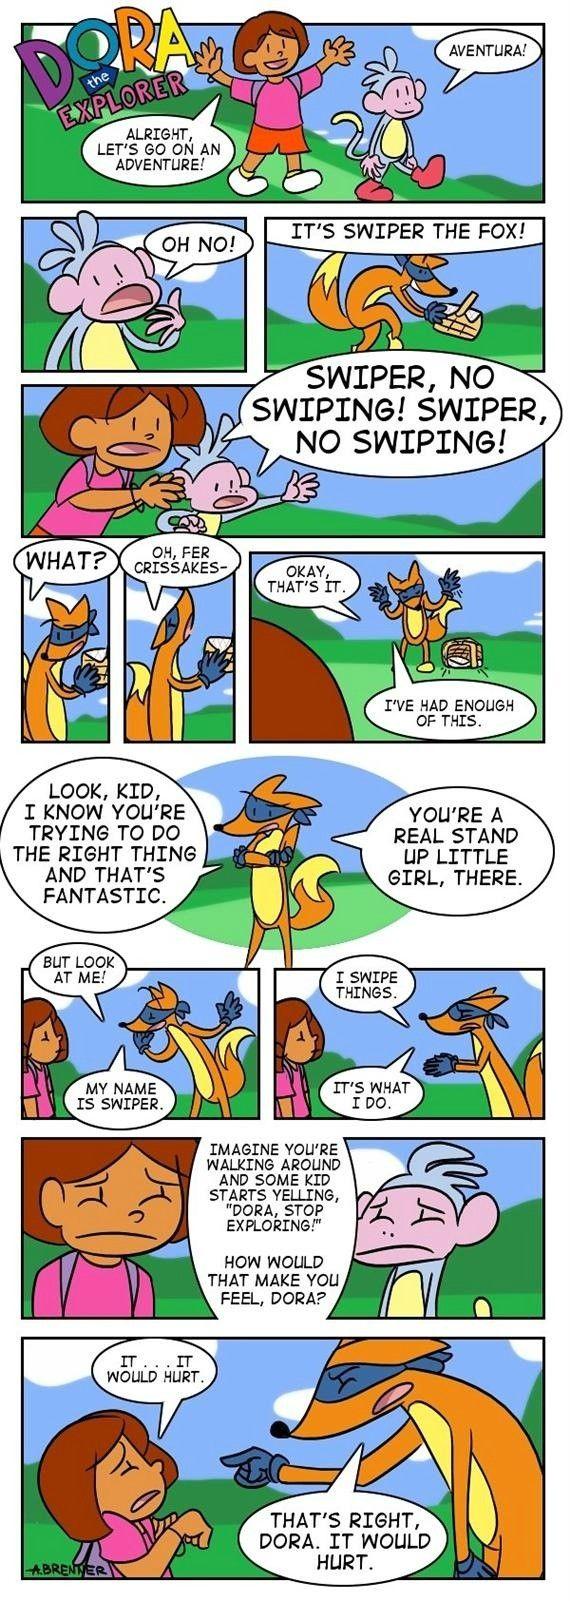 Swiper has had enough. (Comic) - Imgur